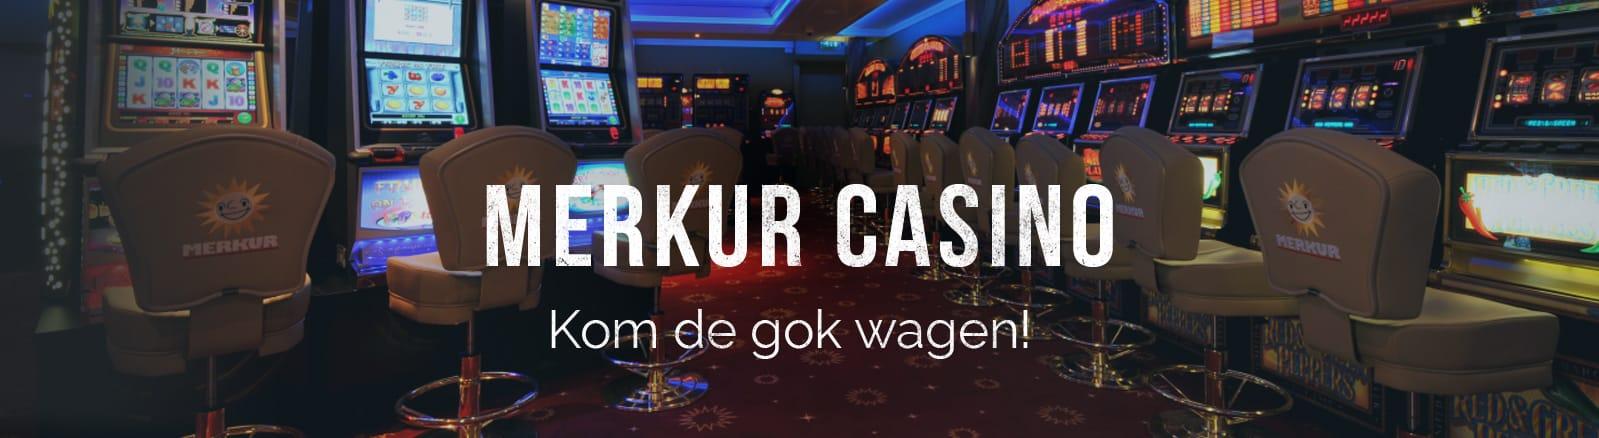 merkur online casinos 2019